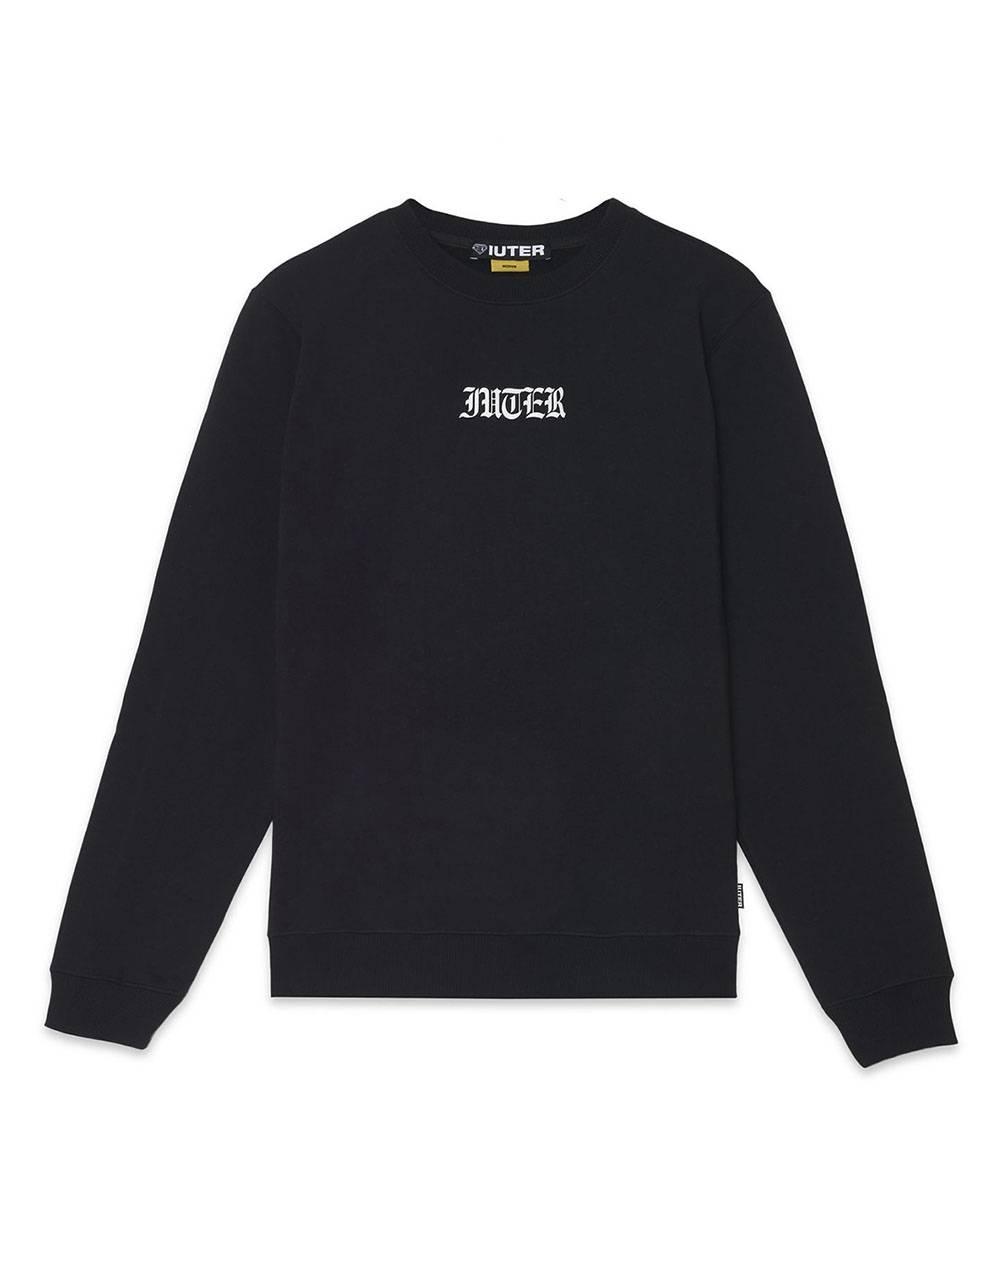 Iuter Noone crewneck sweater - Black IUTER Sweater 89,00€